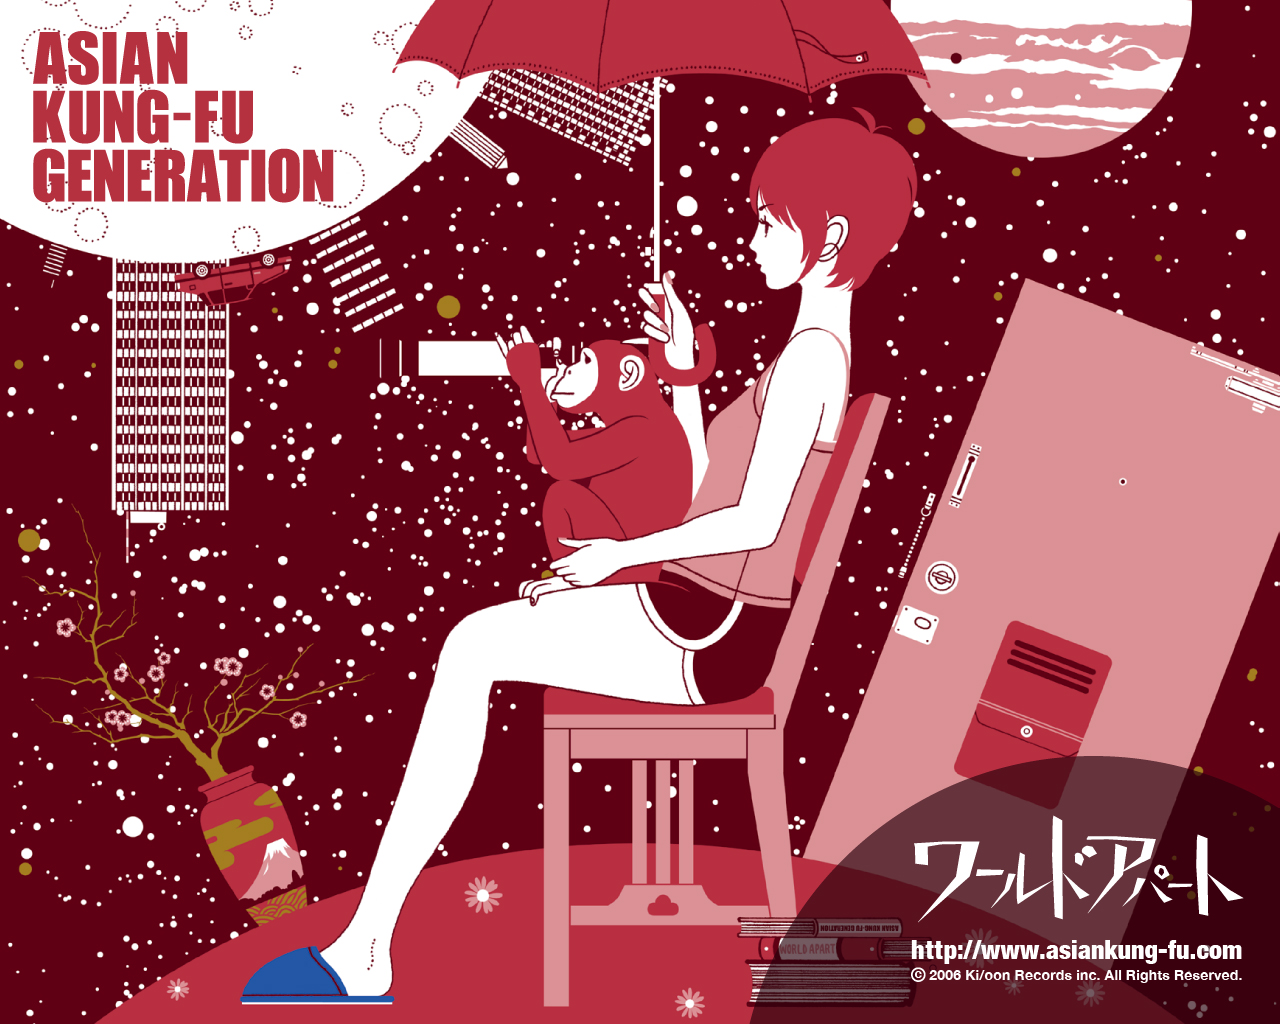 ANGOU NO WALTZ TAB by ASIAN KUNG-FU GENERATION